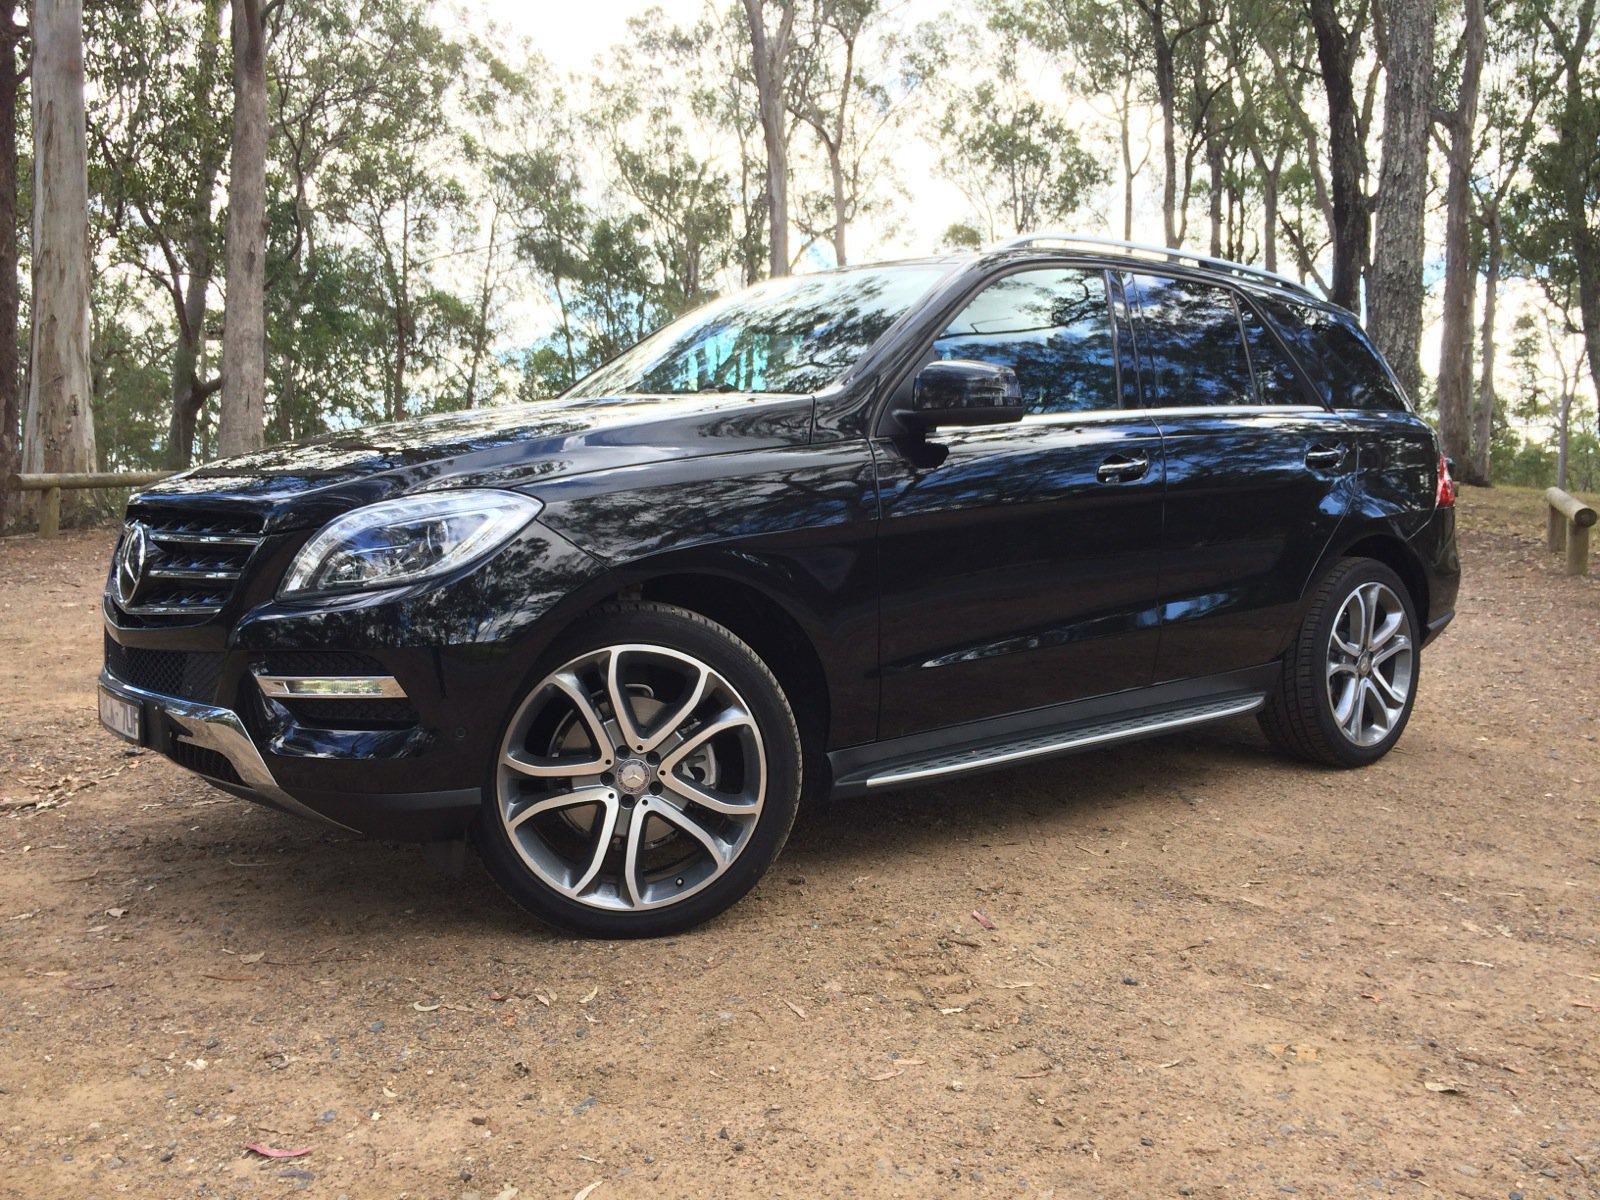 Mercedes-Benz ML 350 Review : LT 1 | CarAdvice